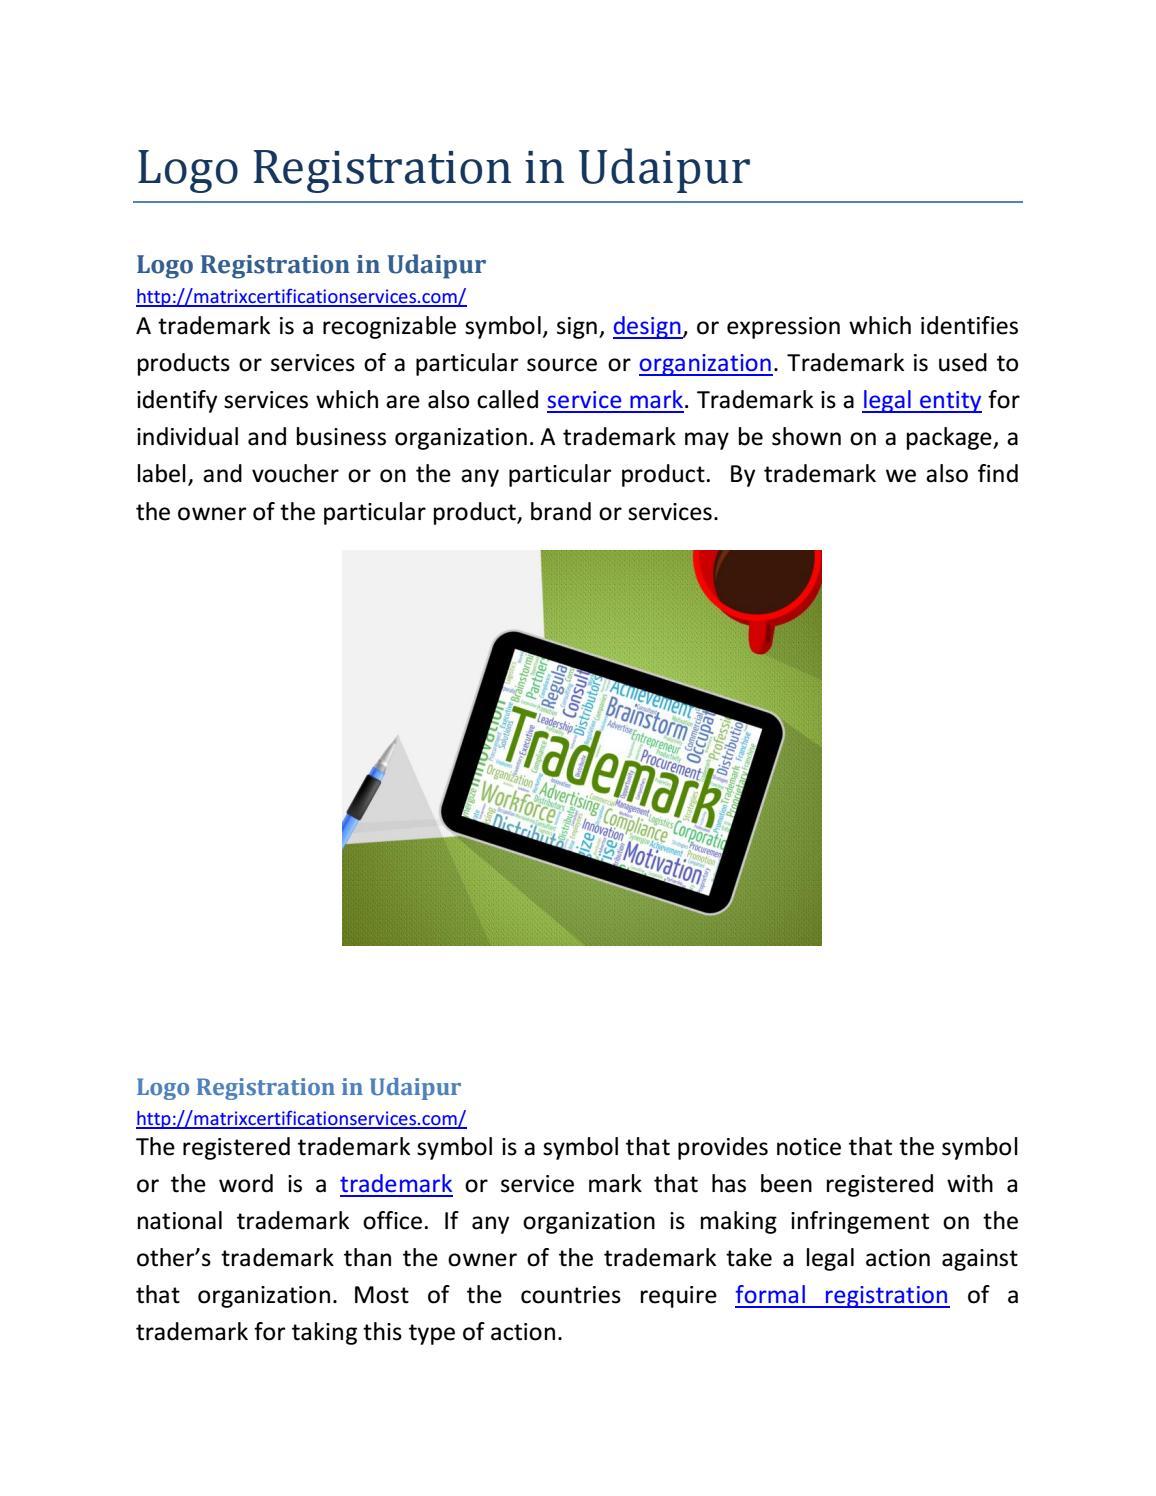 Trademark symbol type choice image symbol and sign ideas logo registration in udaipur by mwebinfotech issuu buycottarizona buycottarizona